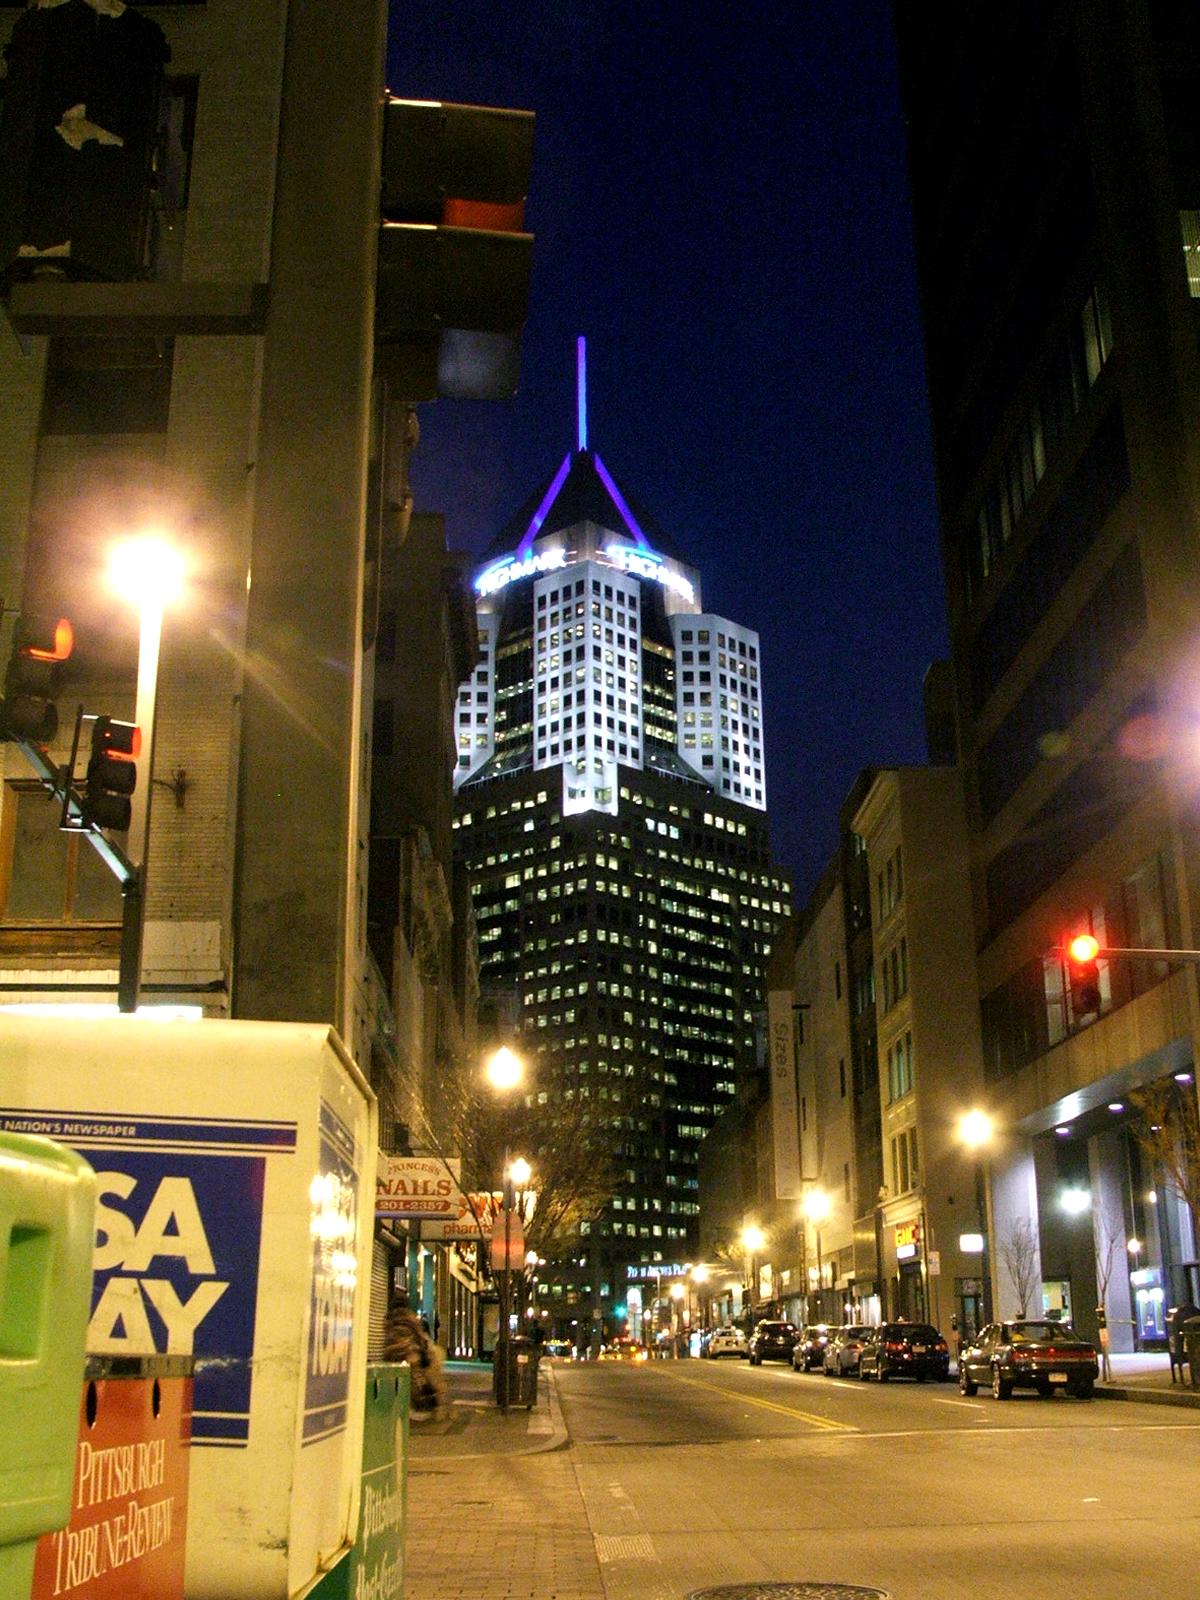 Downtown, Bspo06, Buildings, Light, Night, HQ Photo